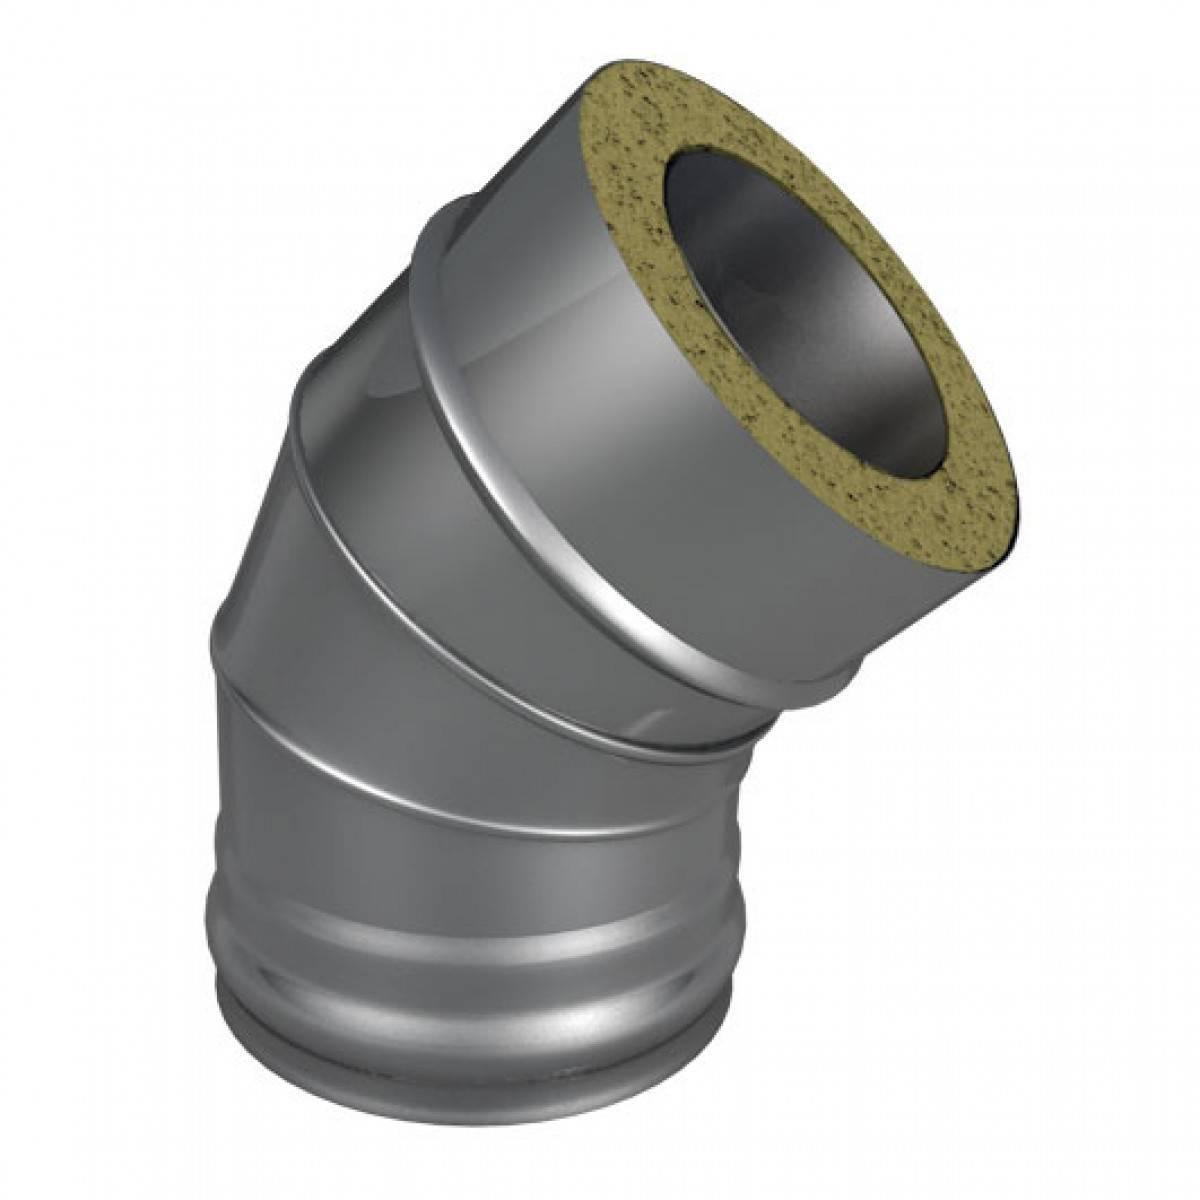 Отвод Термо (430, t0.5/ОЦ, t0.5) 45º, d140/D200(Раструб)